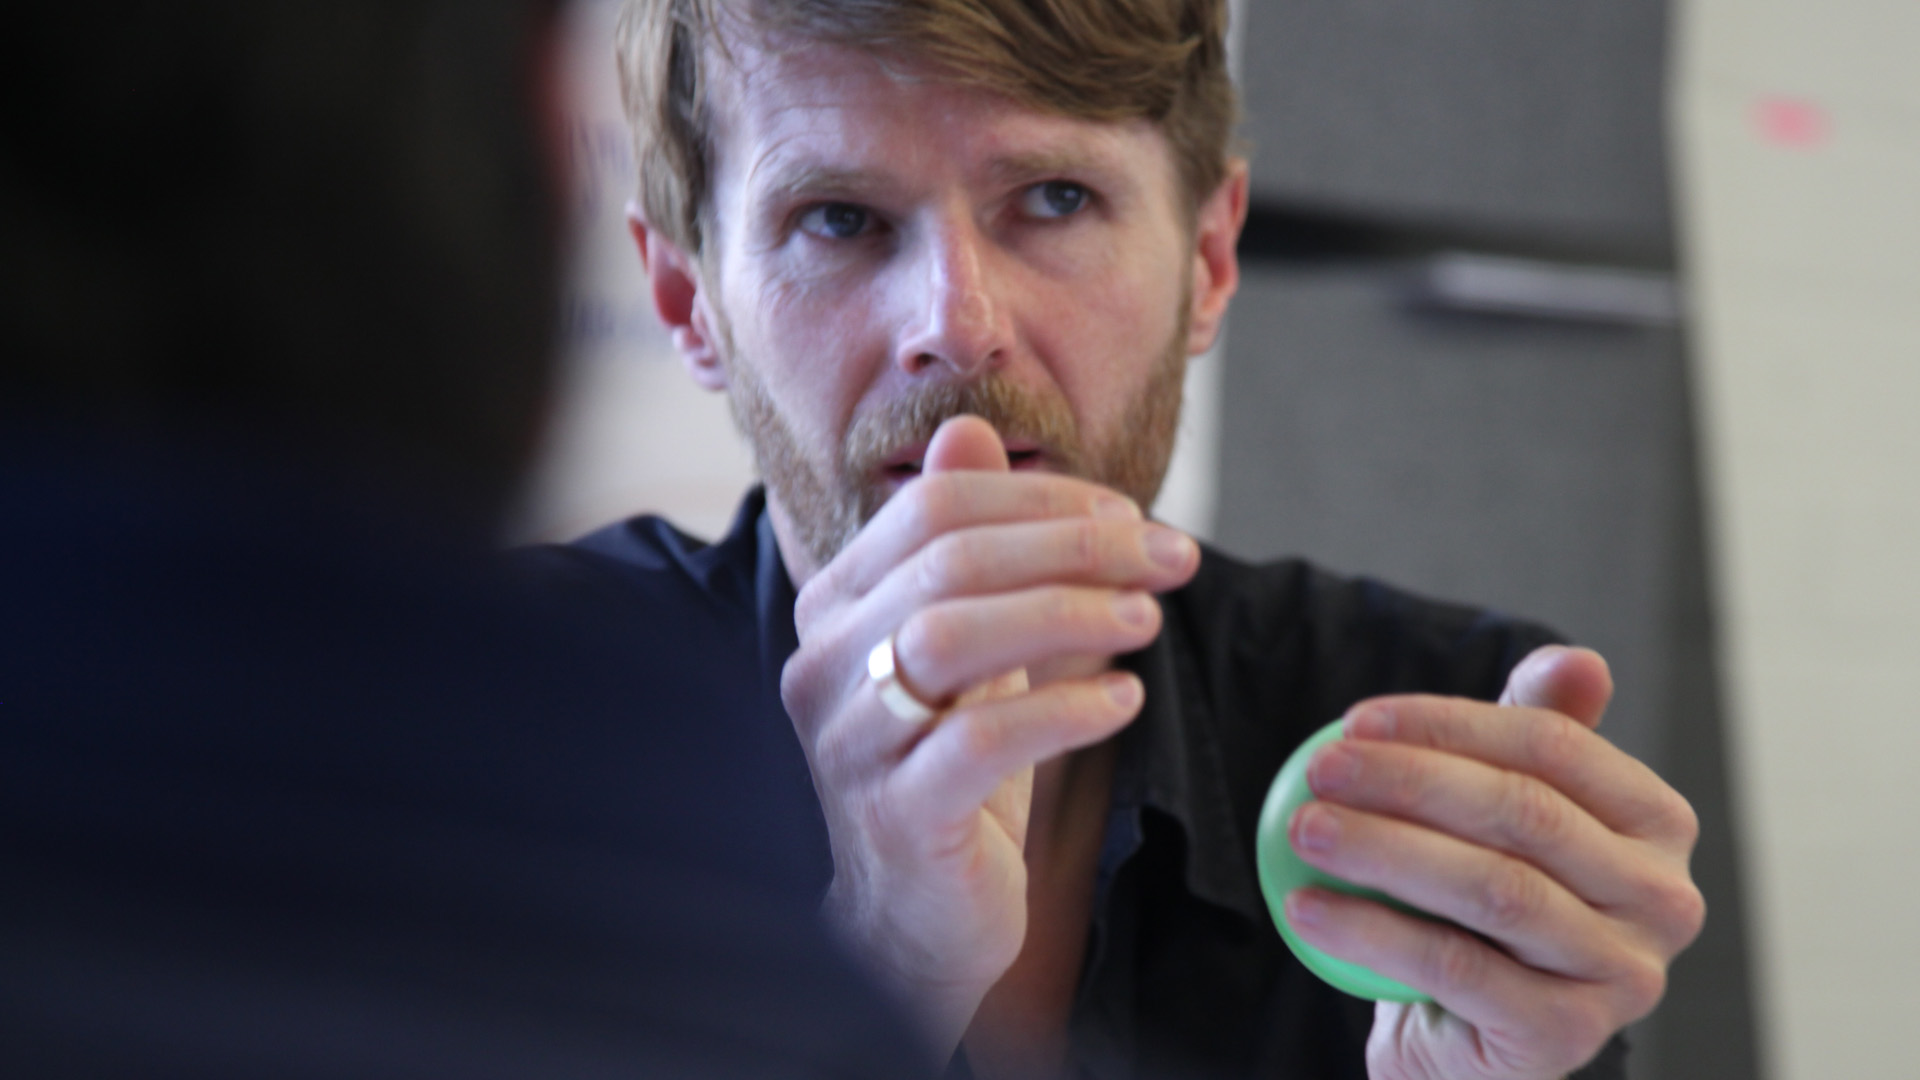 Stefan Haas, Agile Coach